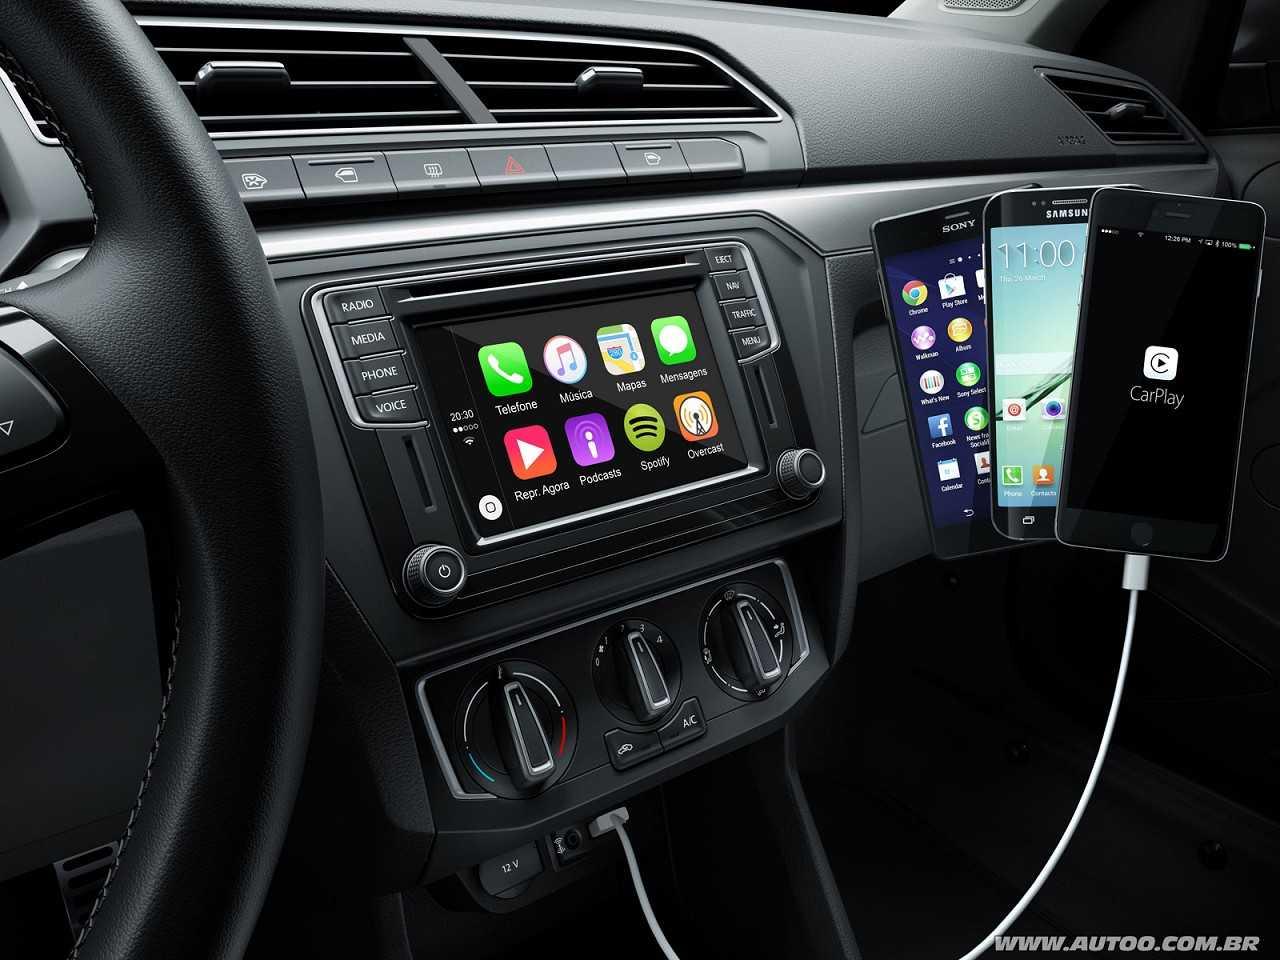 VolkswagenGol 2017 - painel